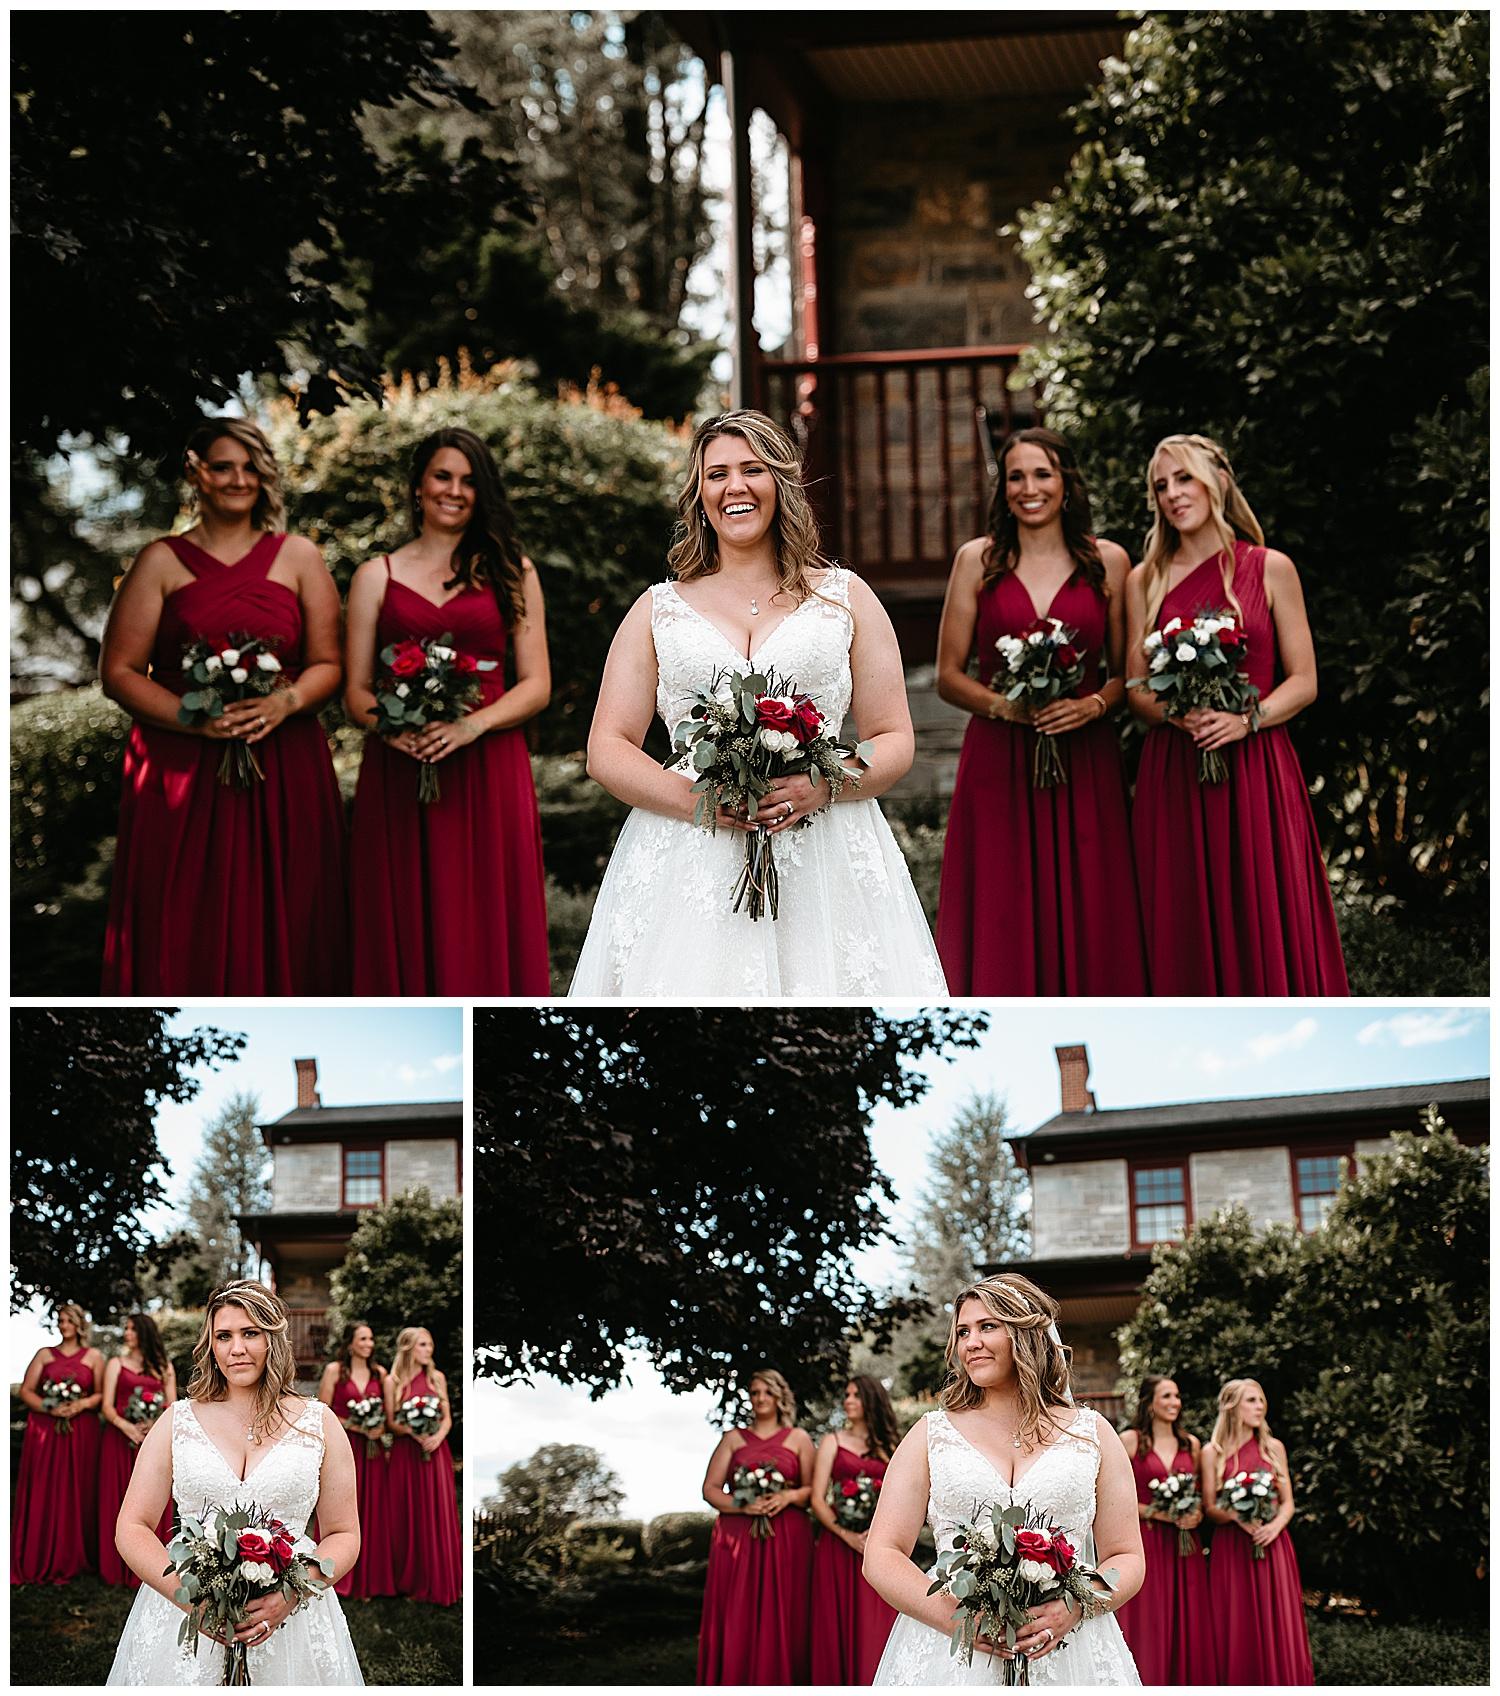 NEPA-Bloomgsburg-Wedding-Photographer-at-The-Barn-at-Greystone-Farms-Watsontown-PA_0078.jpg